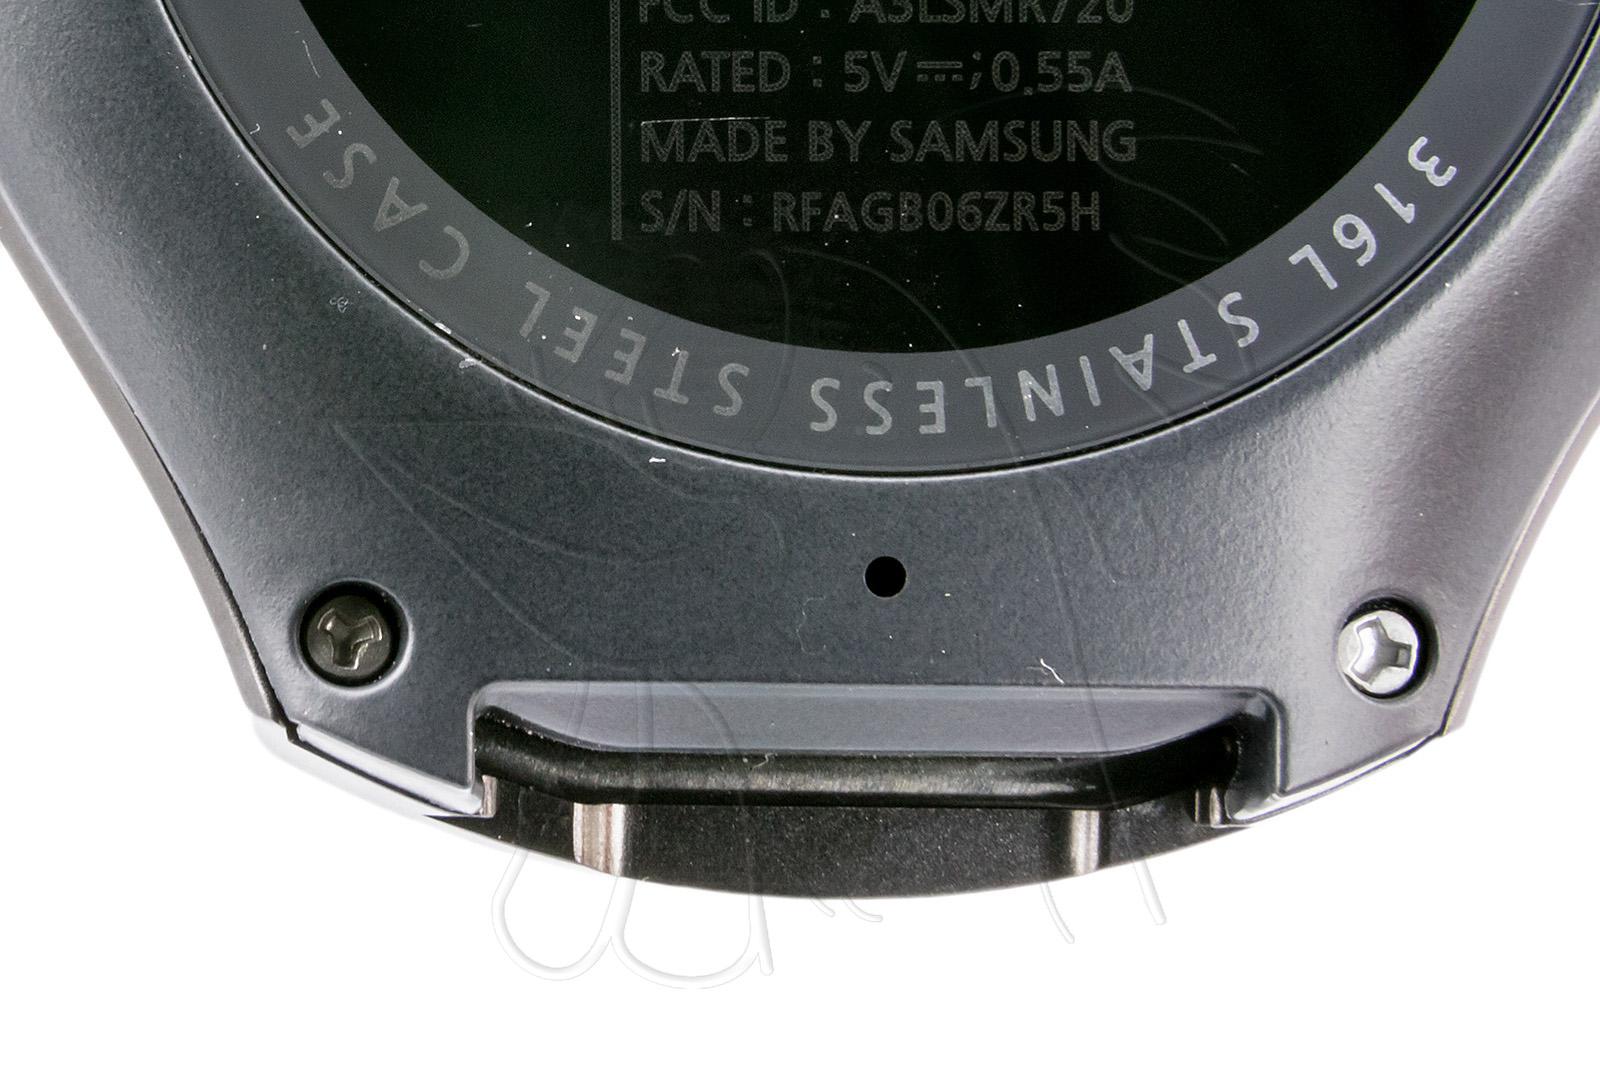 samsung gear s2 user manual pdf